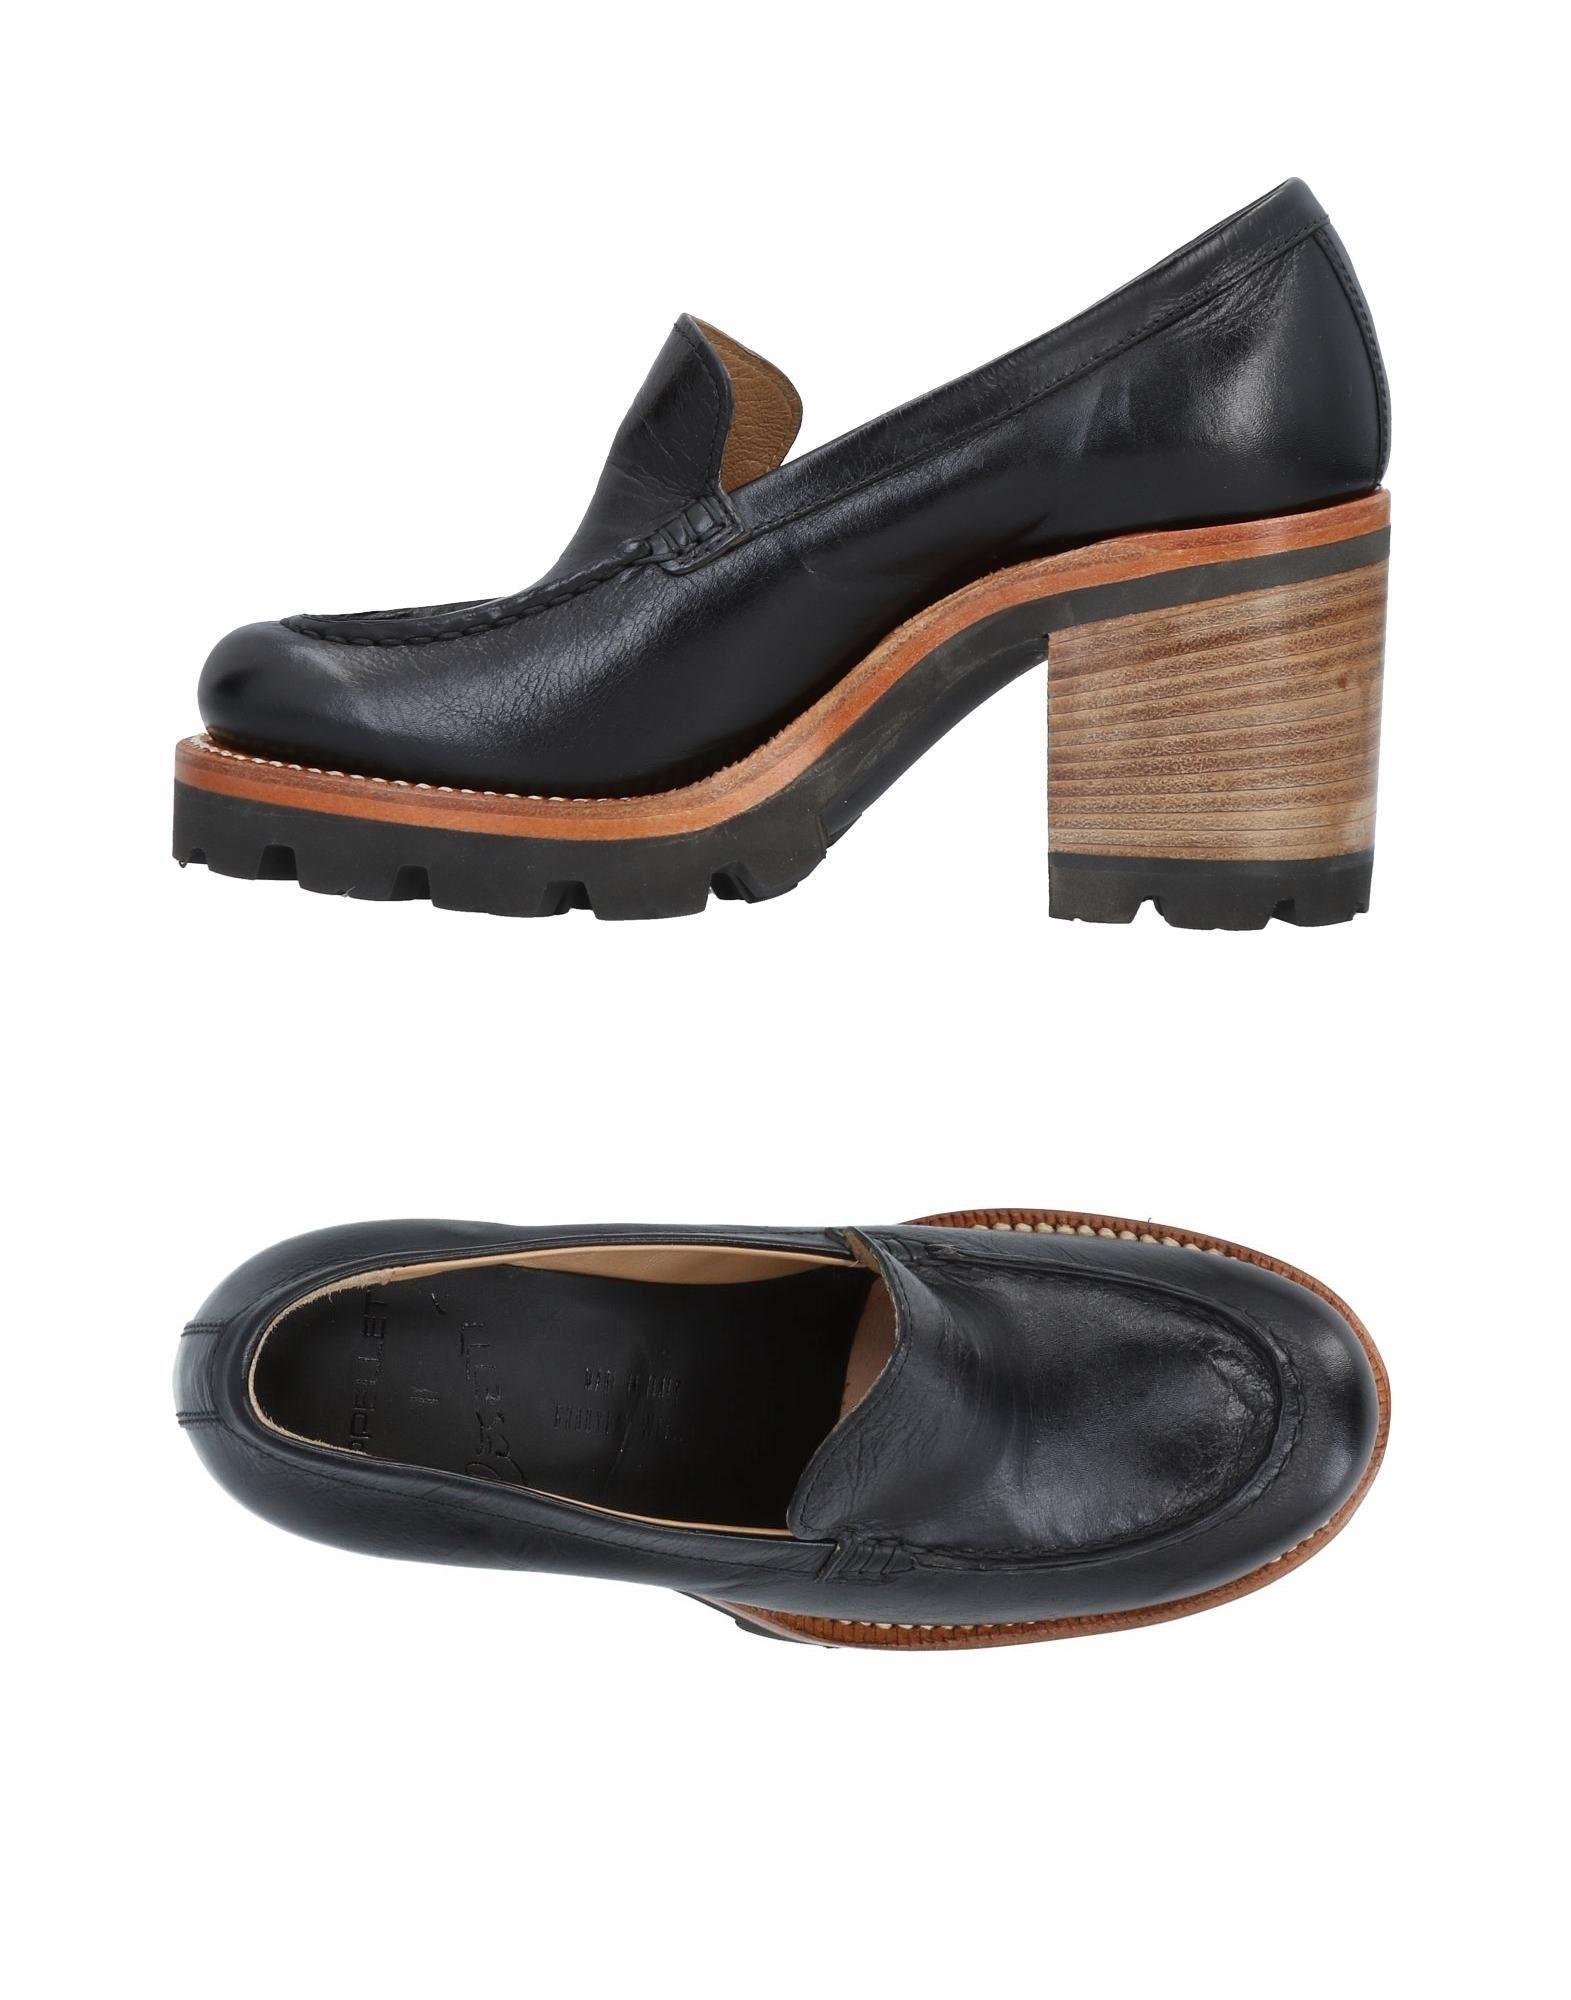 Cappelletti Mokassins Damen  11494459SMGut aussehende strapazierfähige Schuhe